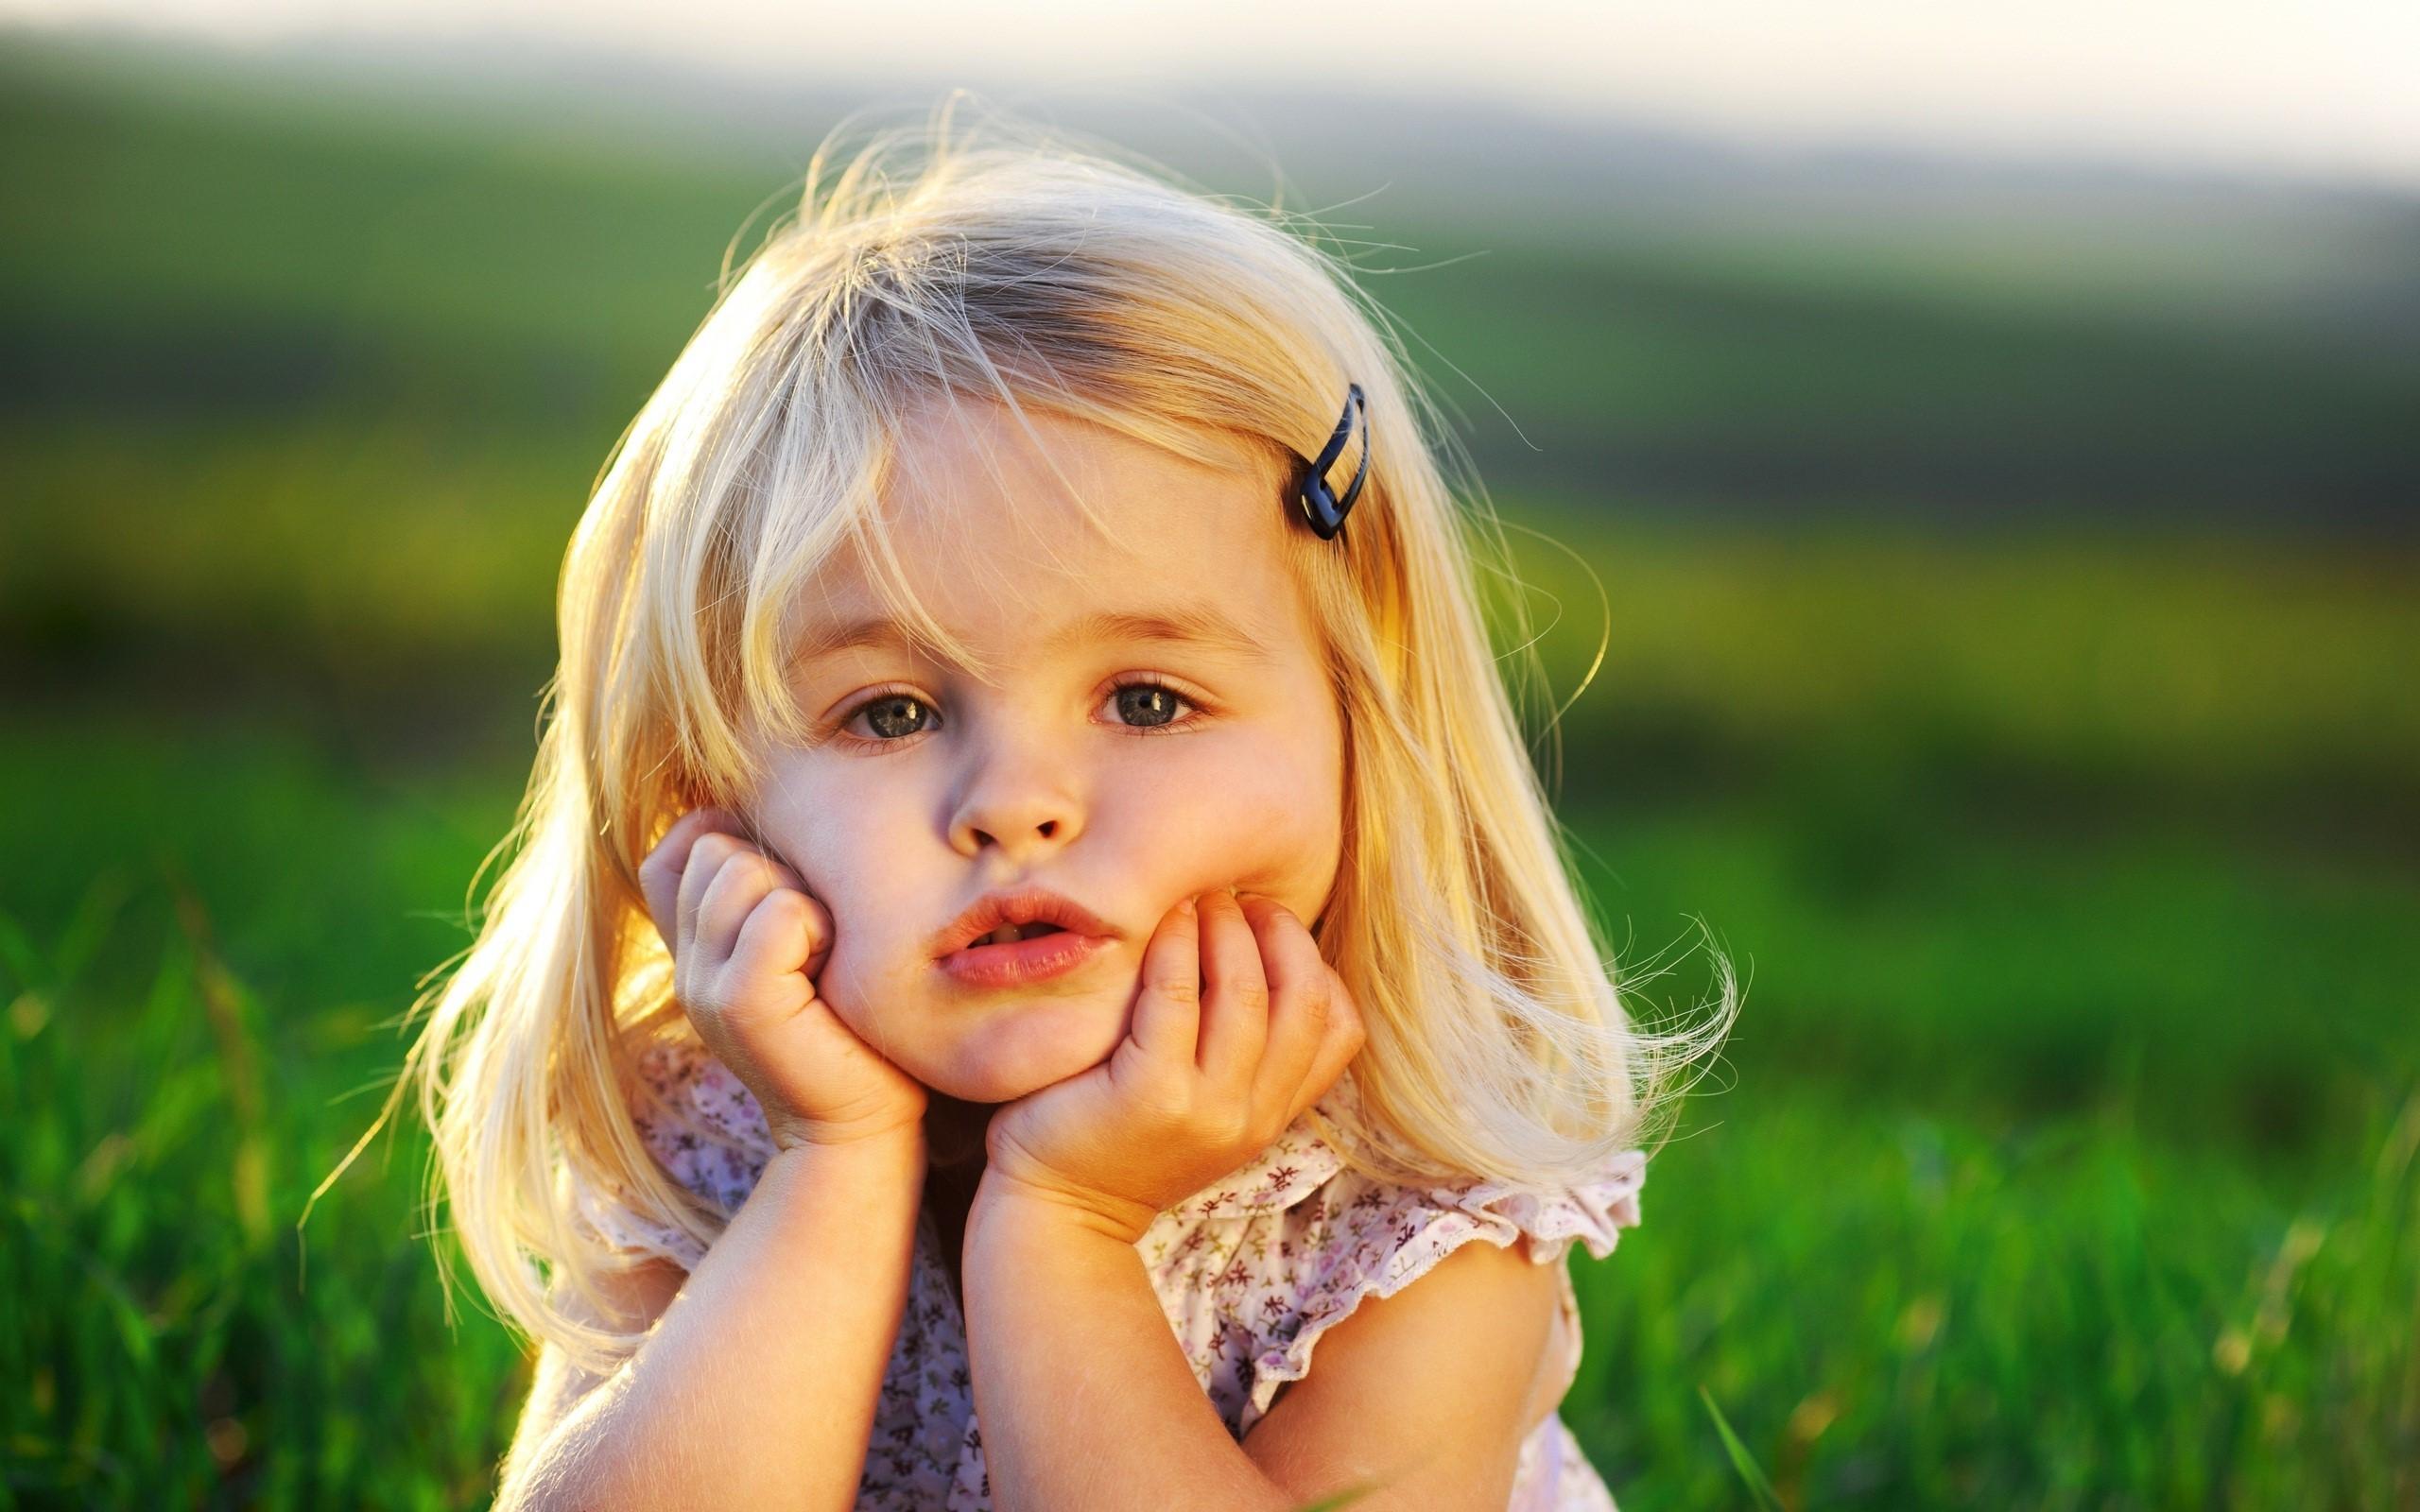 Cute Baby Girl Hd Wallpaper Cute Baby Girl Hd 2560x1600 Wallpaper Teahub Io